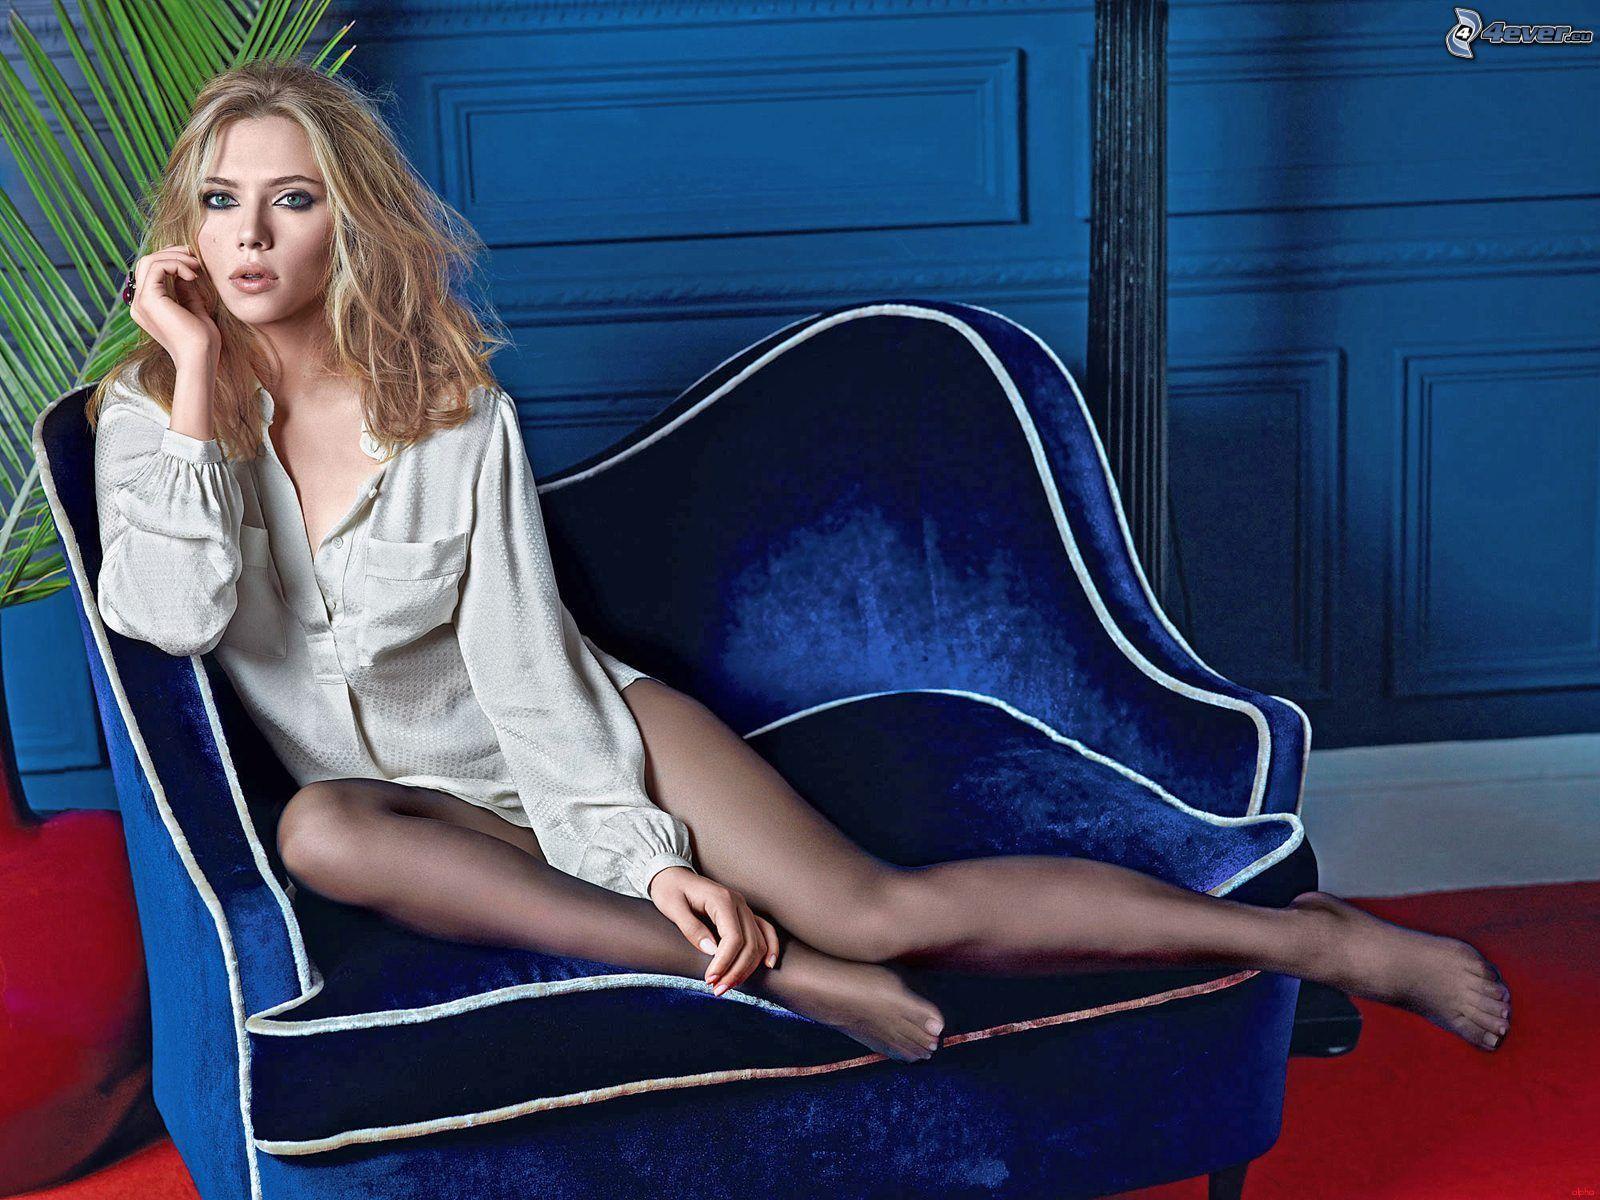 Kleofia pink lace - La Actriz Neoyorkina Scarlett Johansson